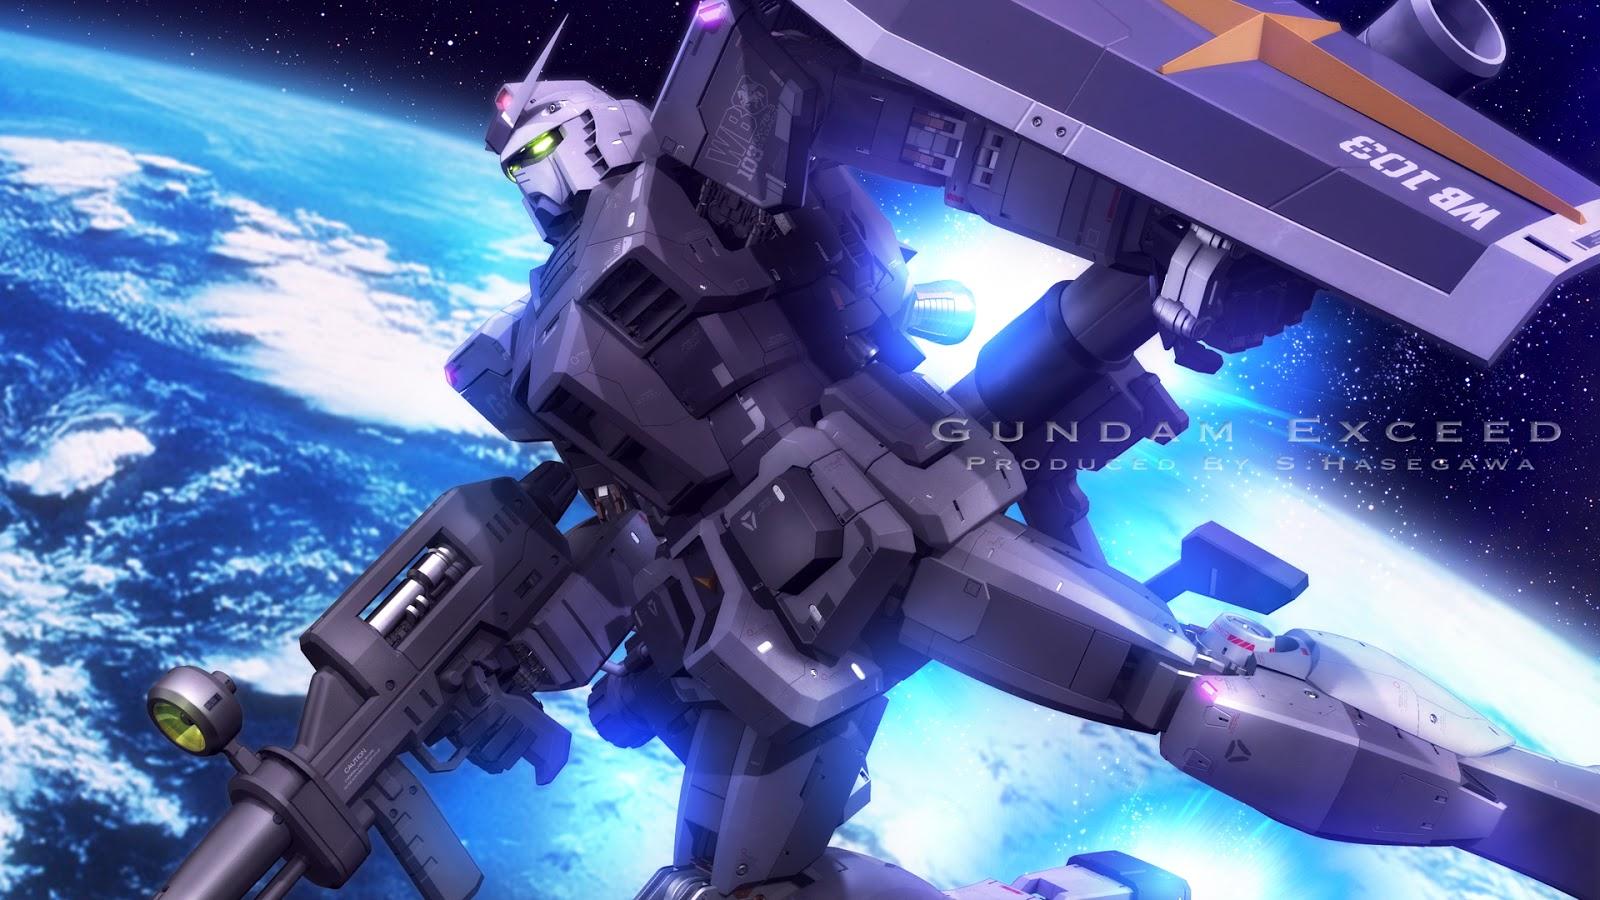 Mobile Fighter G Gundam  Desktop Nexus Wallpapers